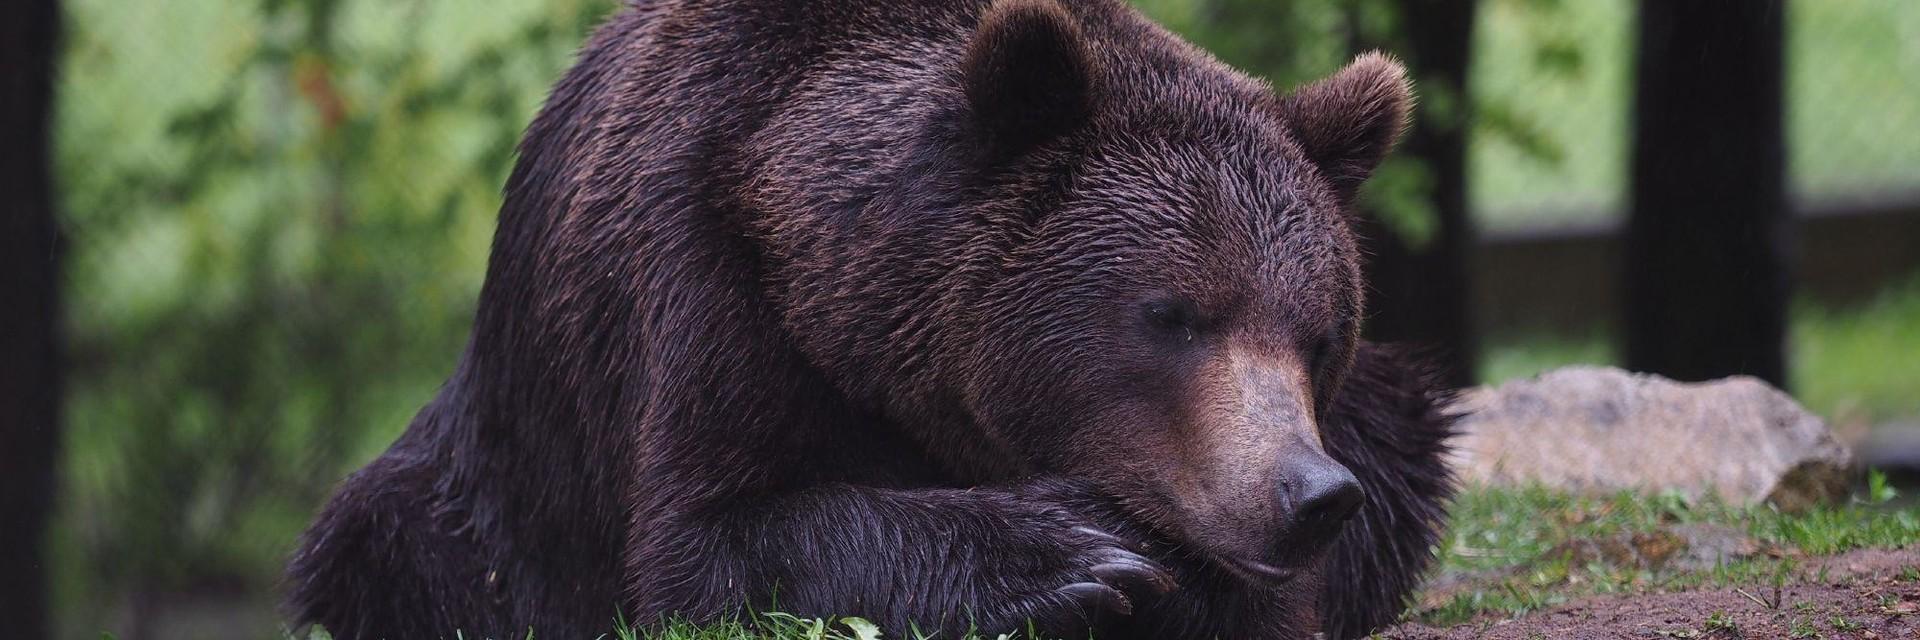 Bear Erich in Arbesbach